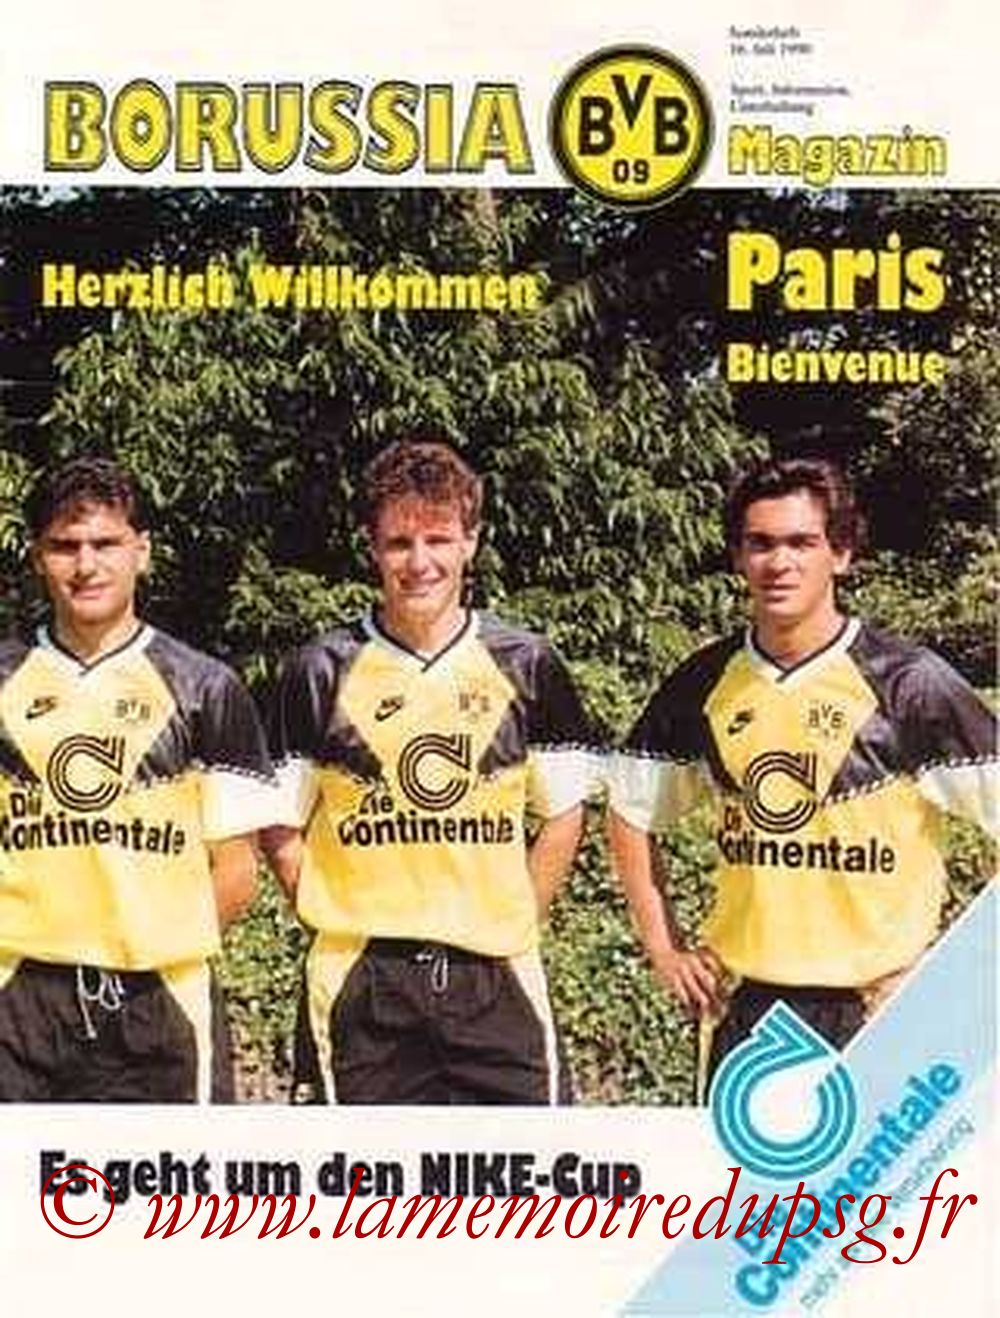 1990-07-16  Borussia Dortmund-PSG (Nike cup à Dortmund, Borussia Magazin)